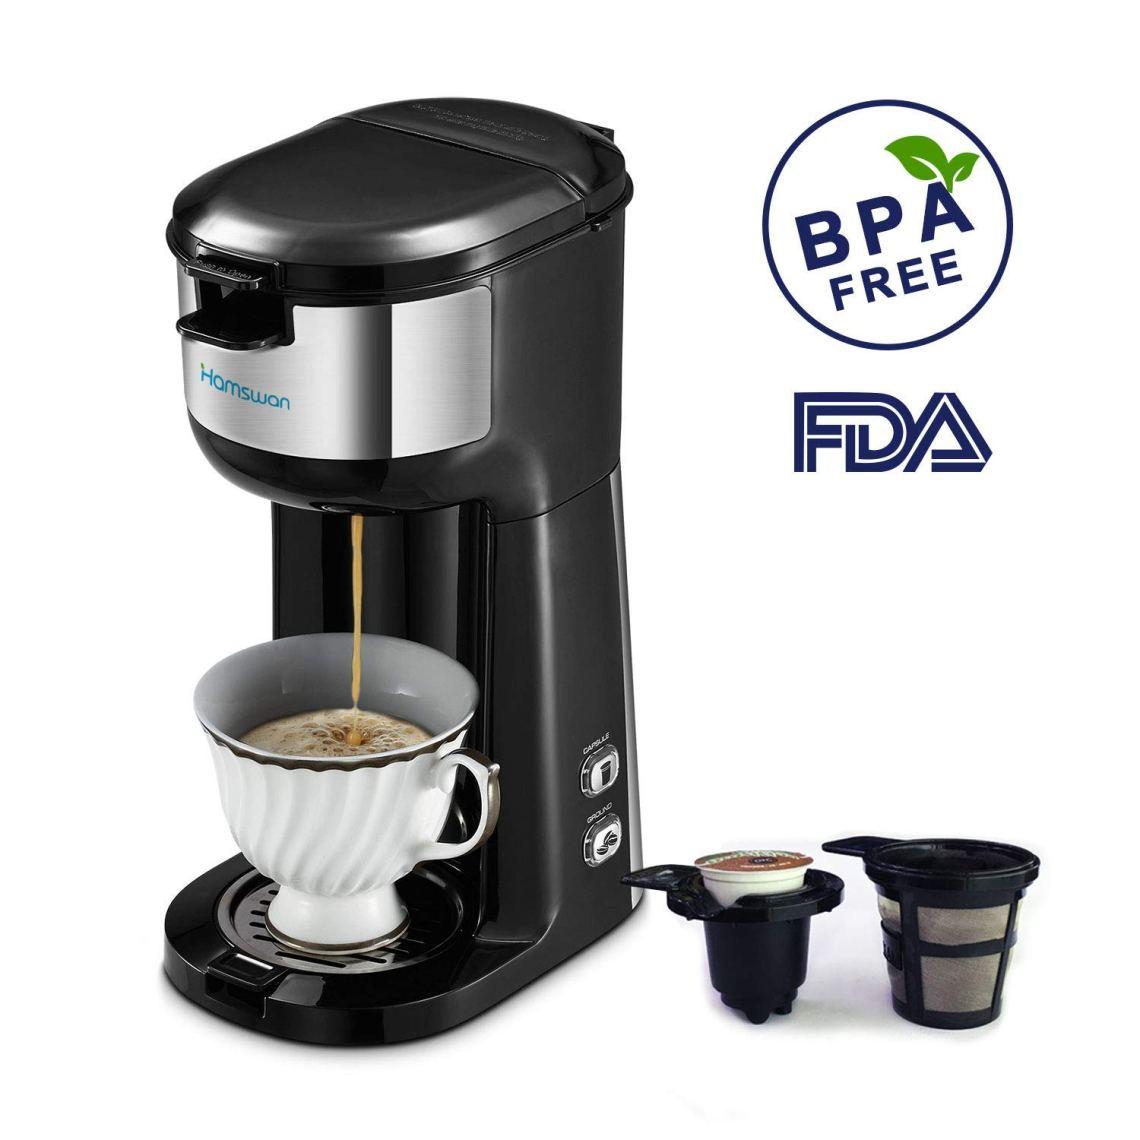 Braun-Drip-Coffee-Maker